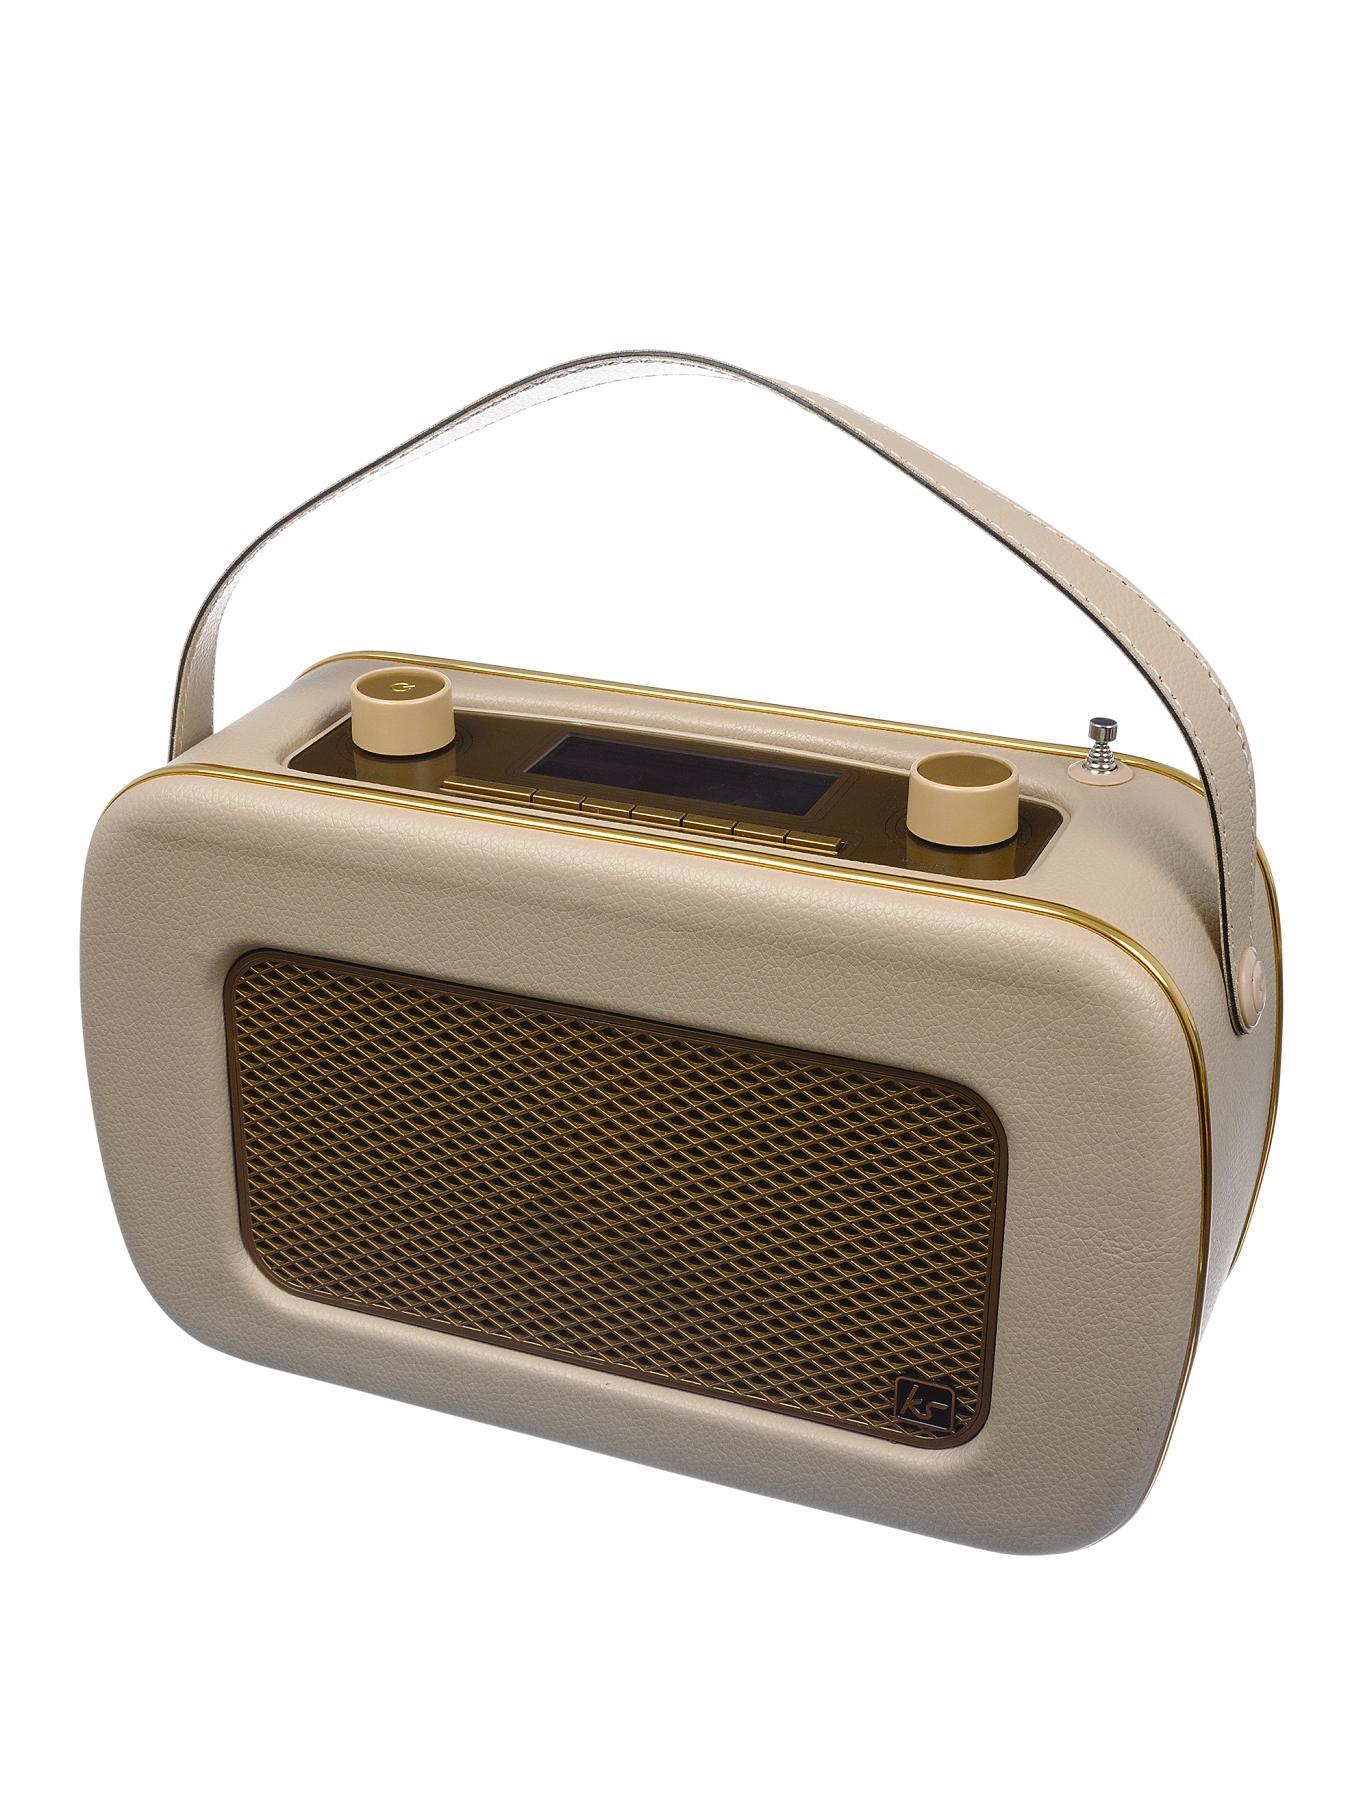 Kitsound Jive DAB Radio - Cream